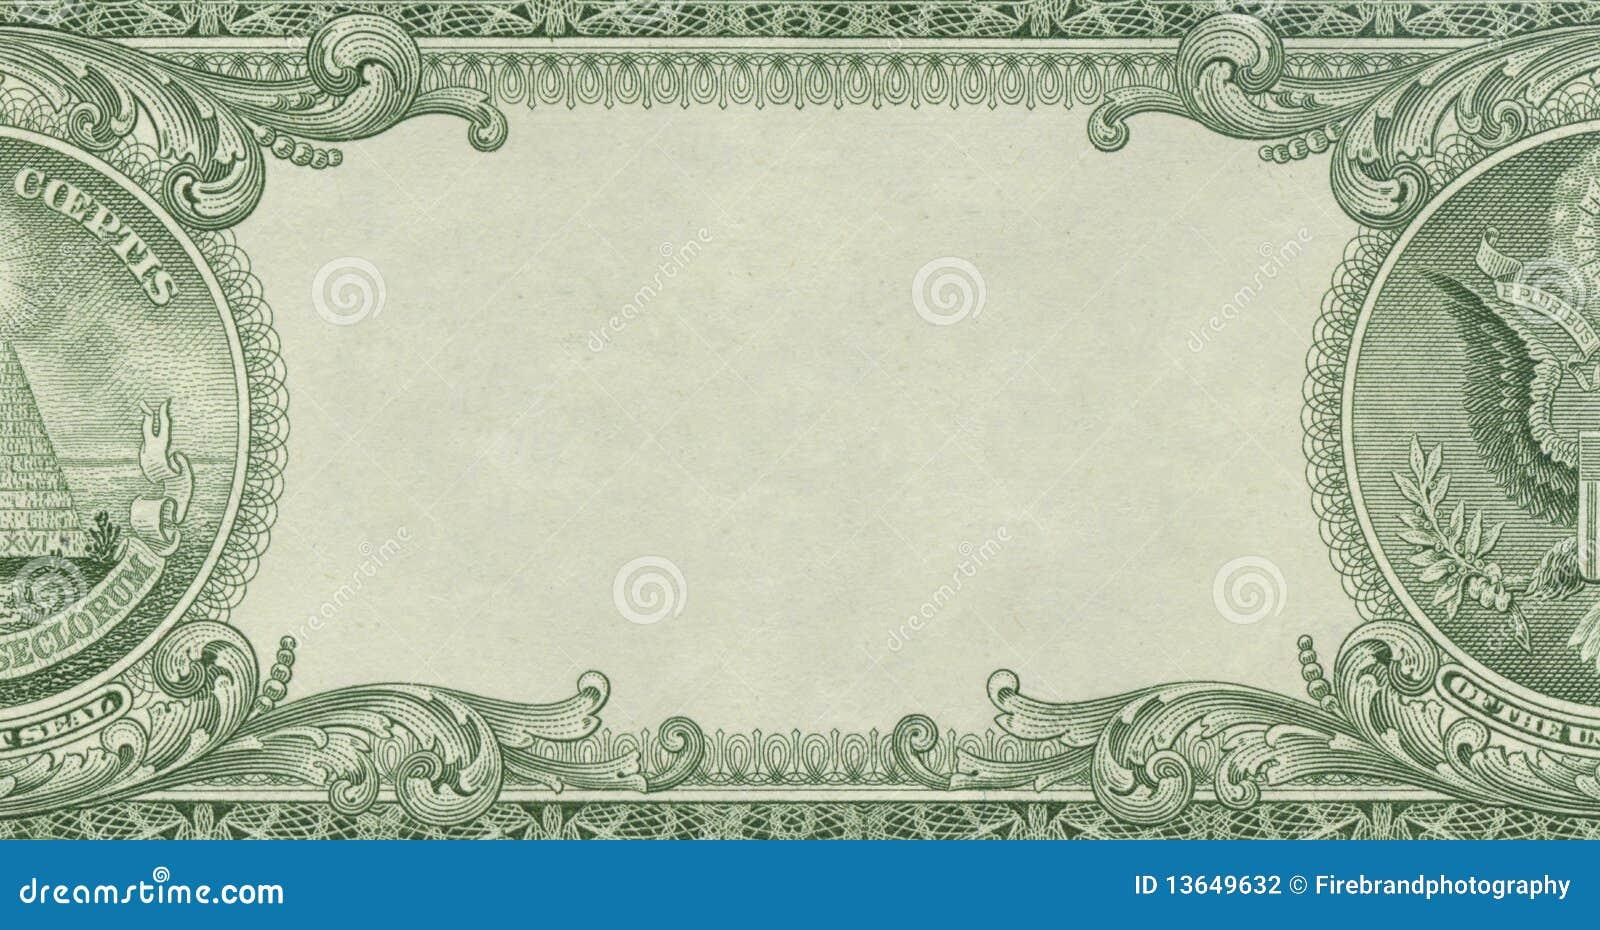 Economy frames coupon